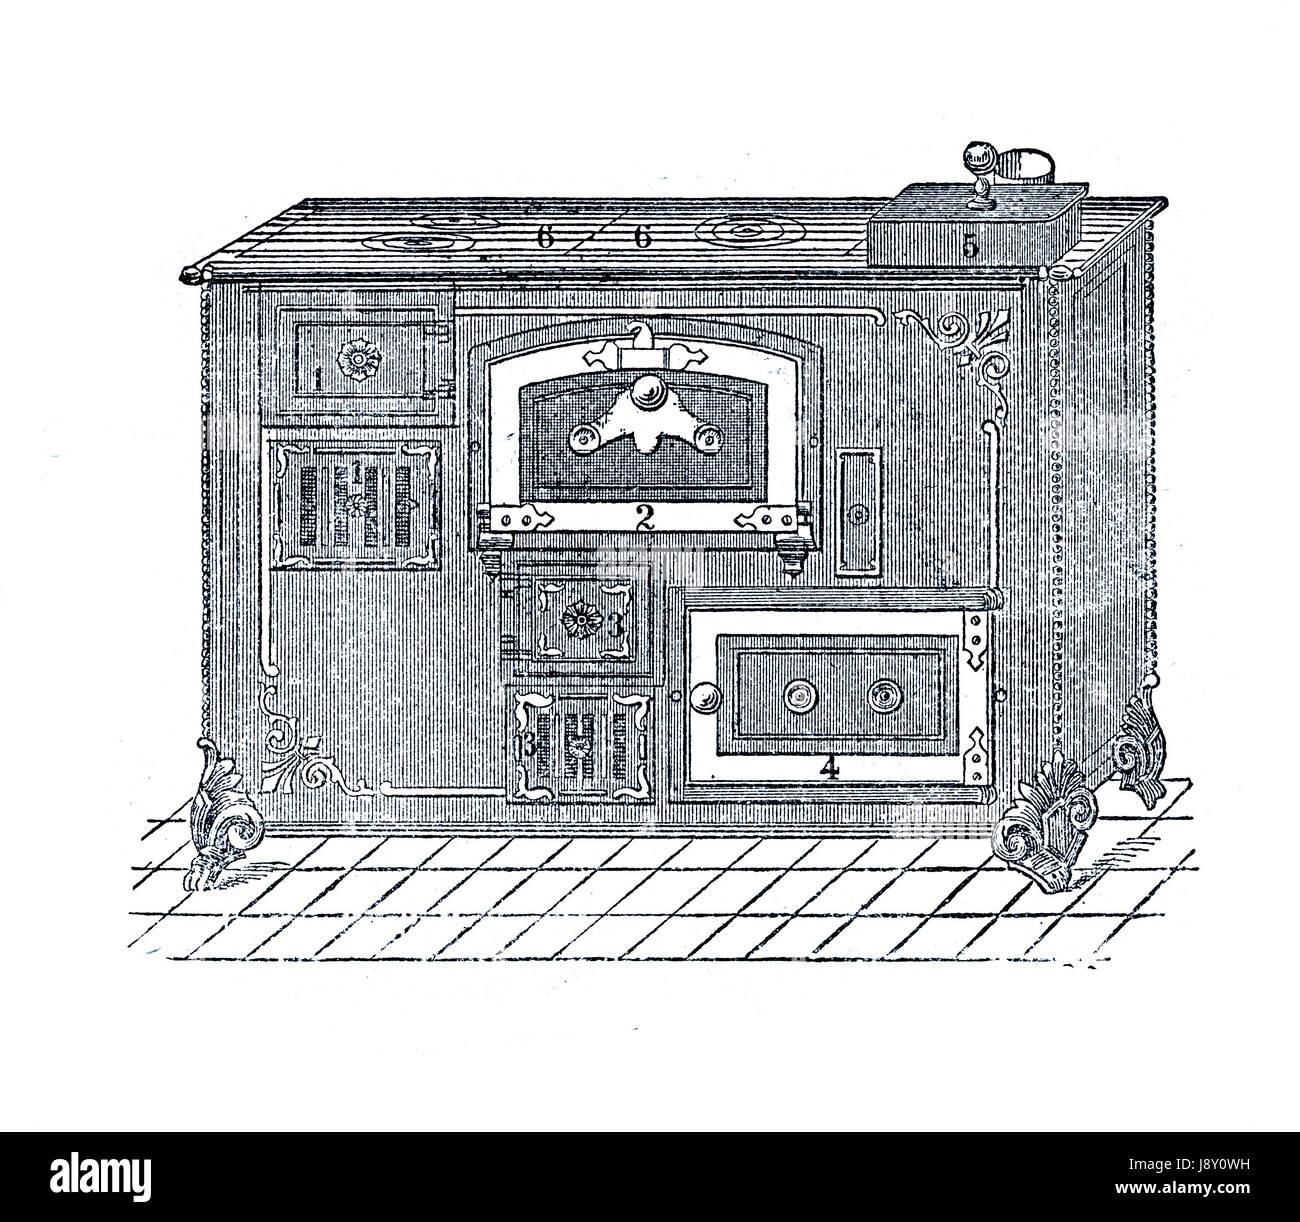 Cooking stove, vintage illustration - Stock Image